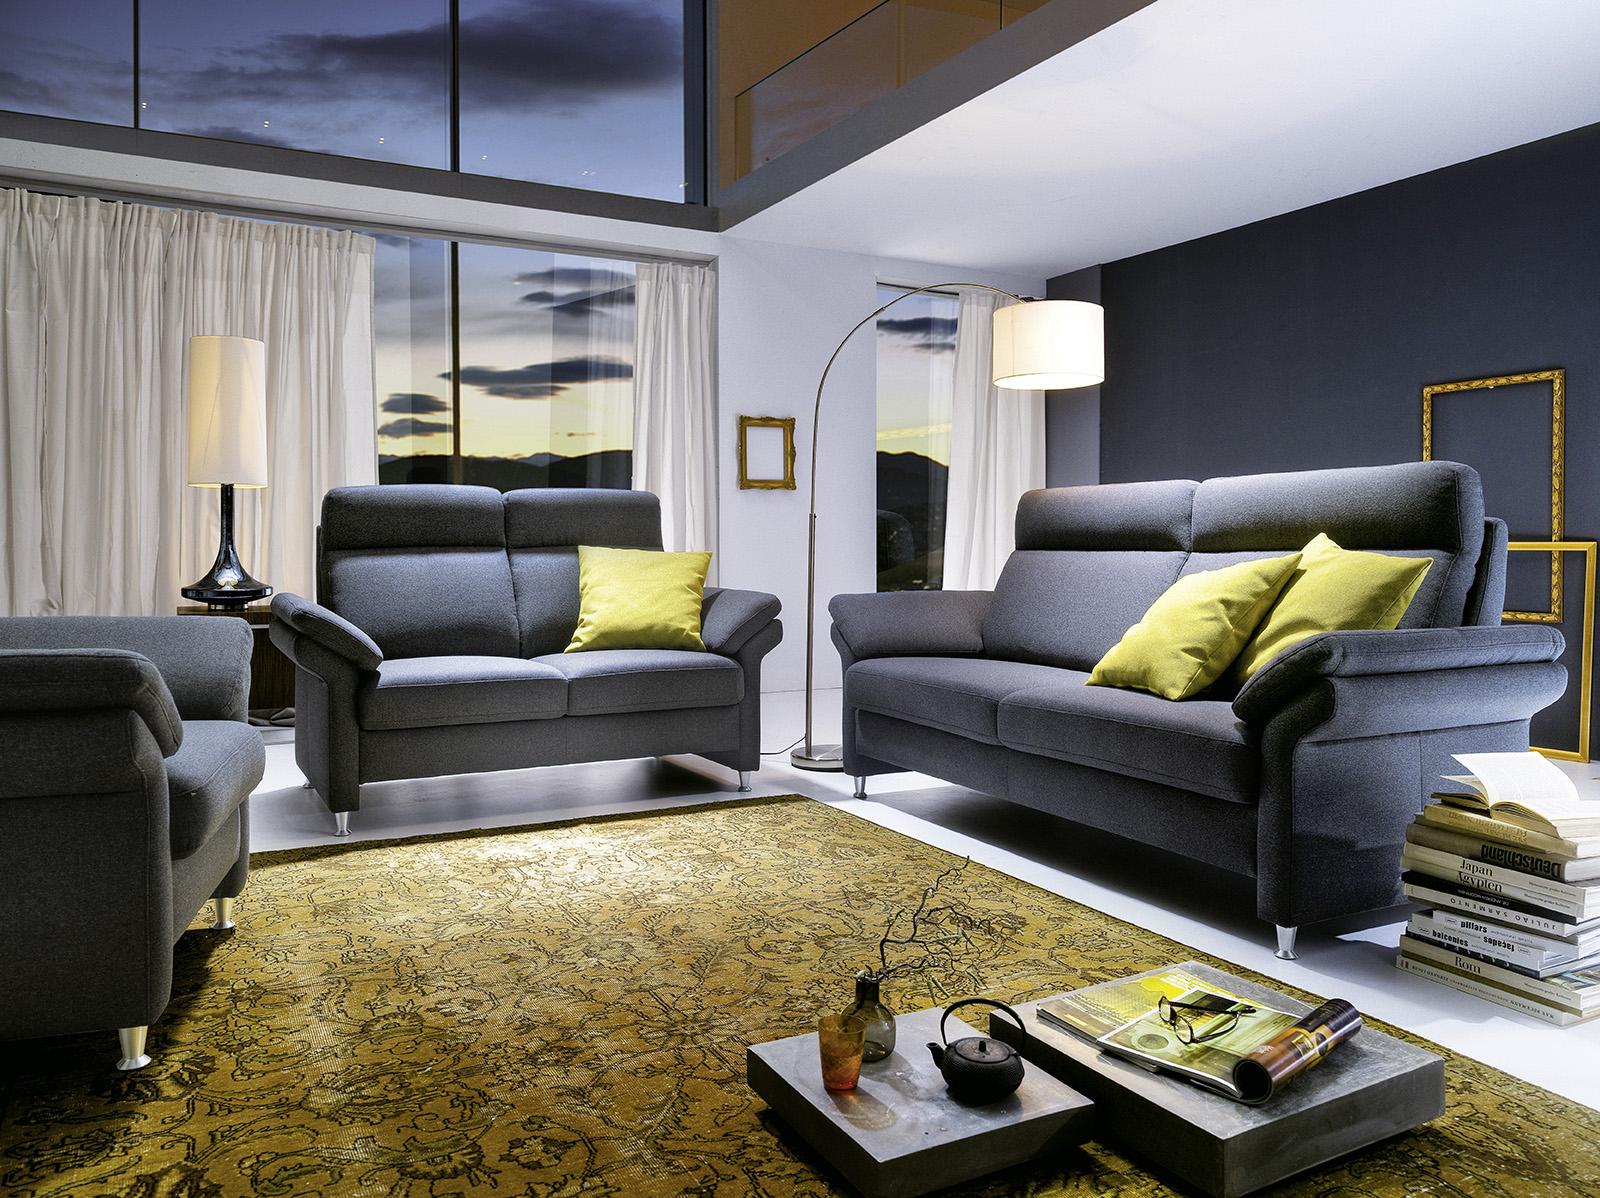 sofa 2 sitzer fl601 in stoffbezug anthrazit flamme. Black Bedroom Furniture Sets. Home Design Ideas